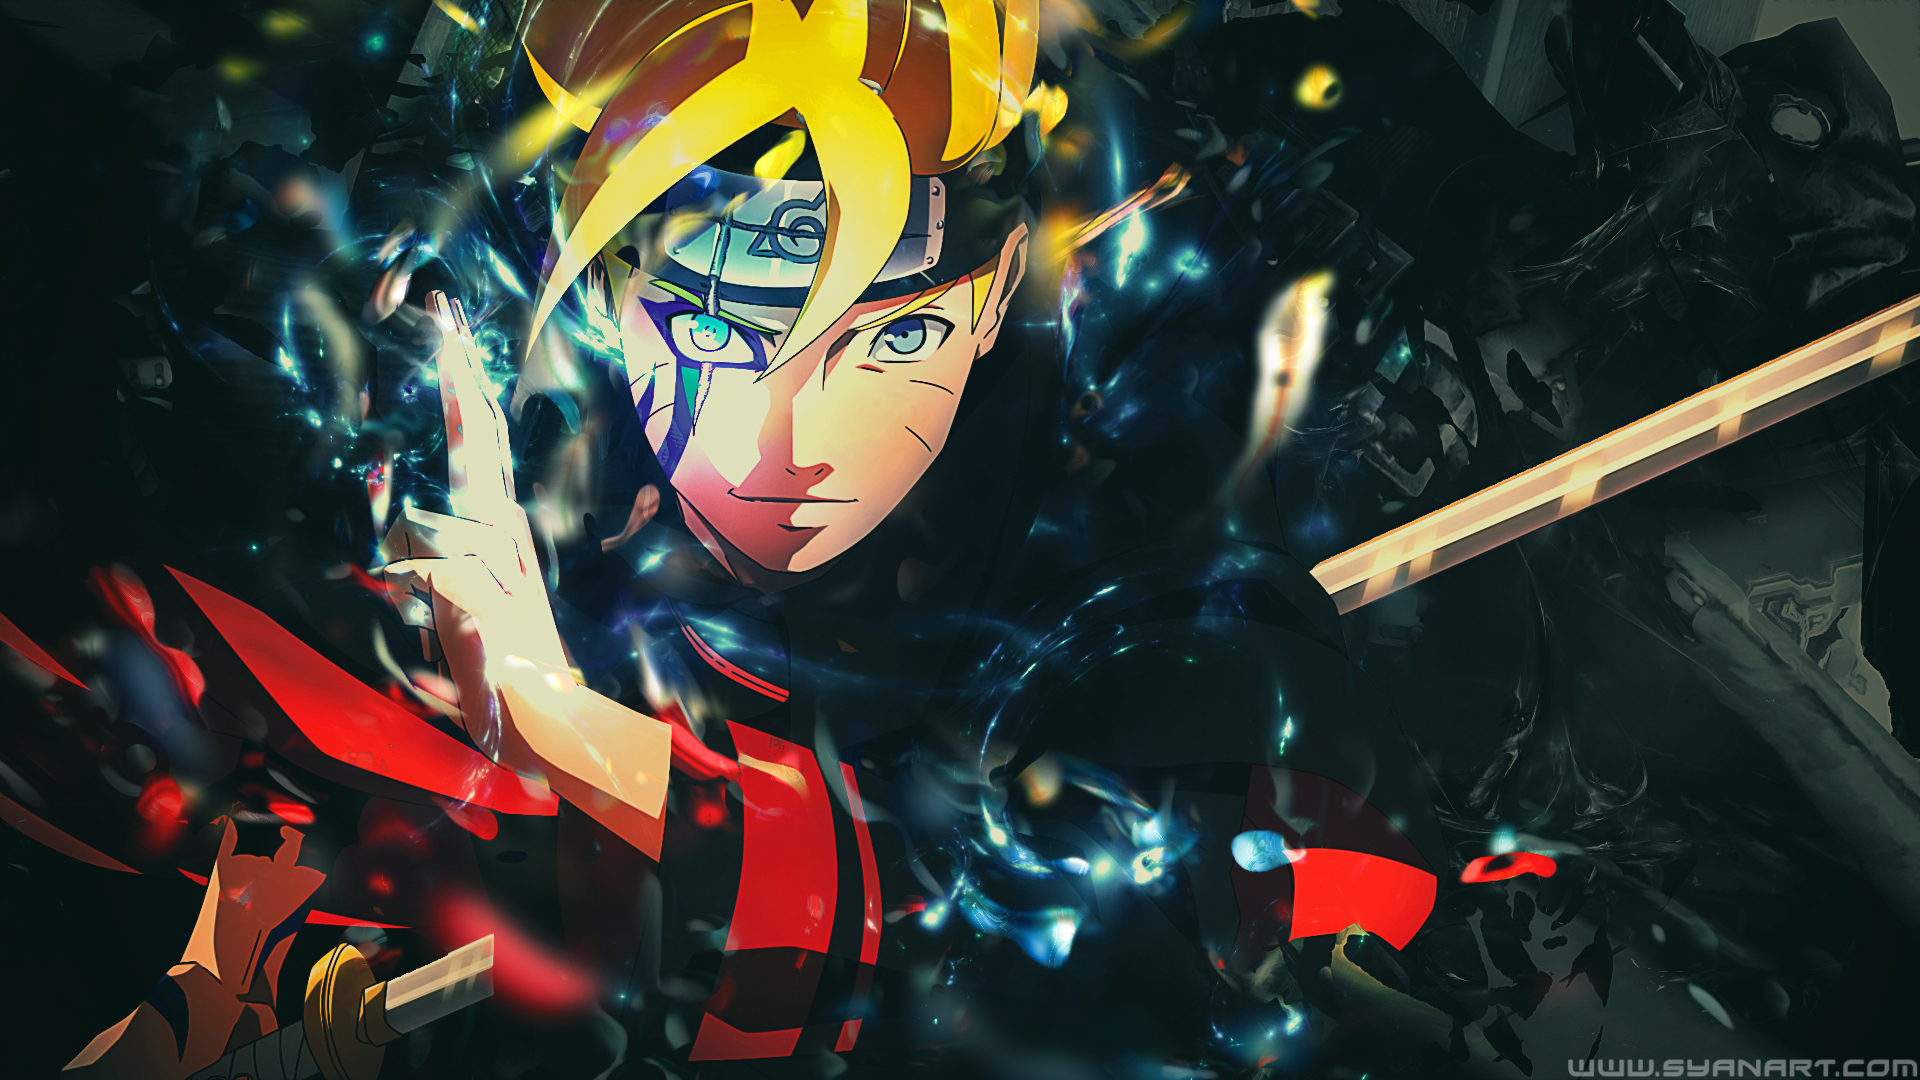 Cool Wallpaper Naruto Top - Boruto-Next-Generations-Wallpaper  Snapshot.jpg